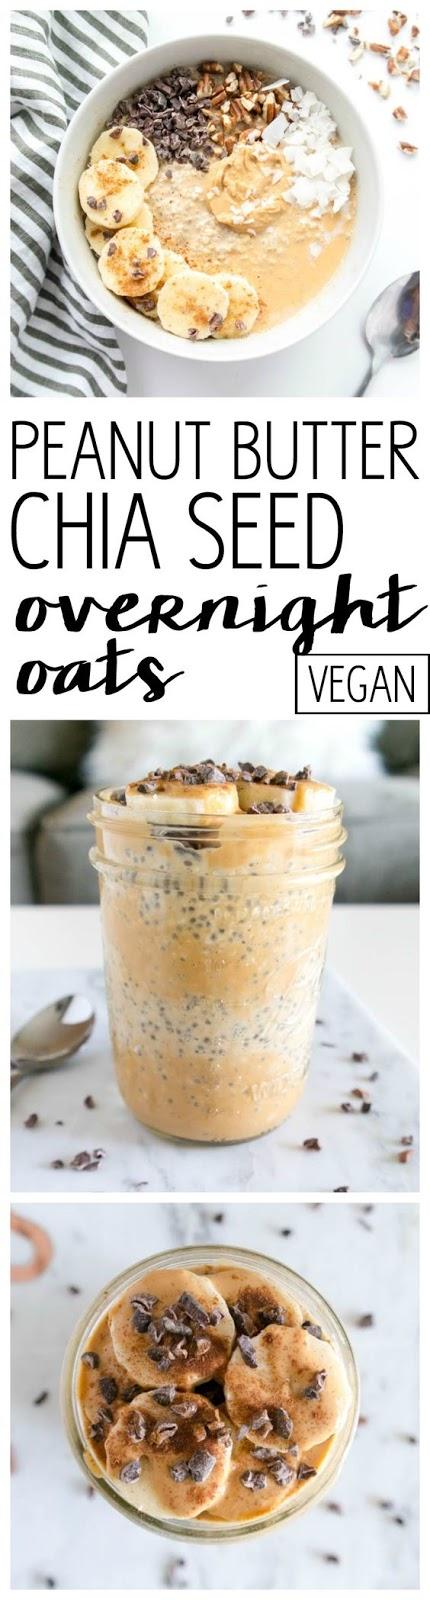 peanut butter chia overnight oats